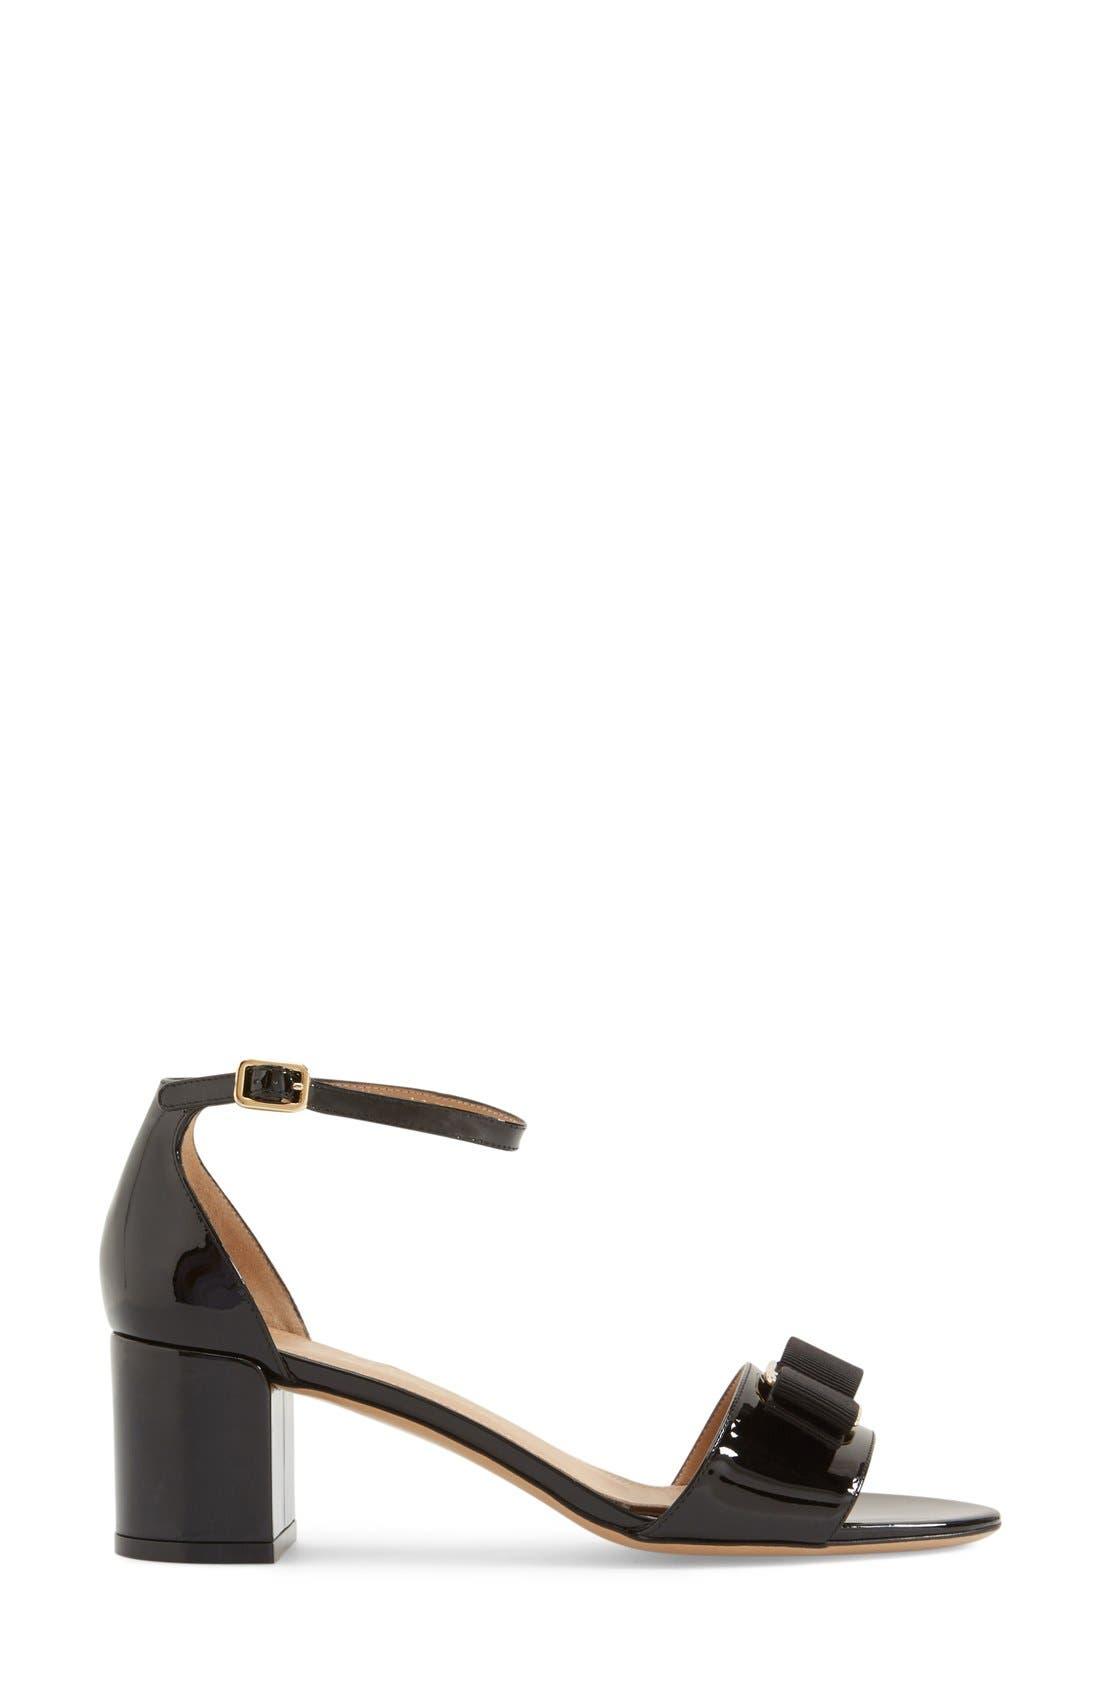 Gavina Block Heel Bow Sandal,                             Alternate thumbnail 4, color,                             Black Patent